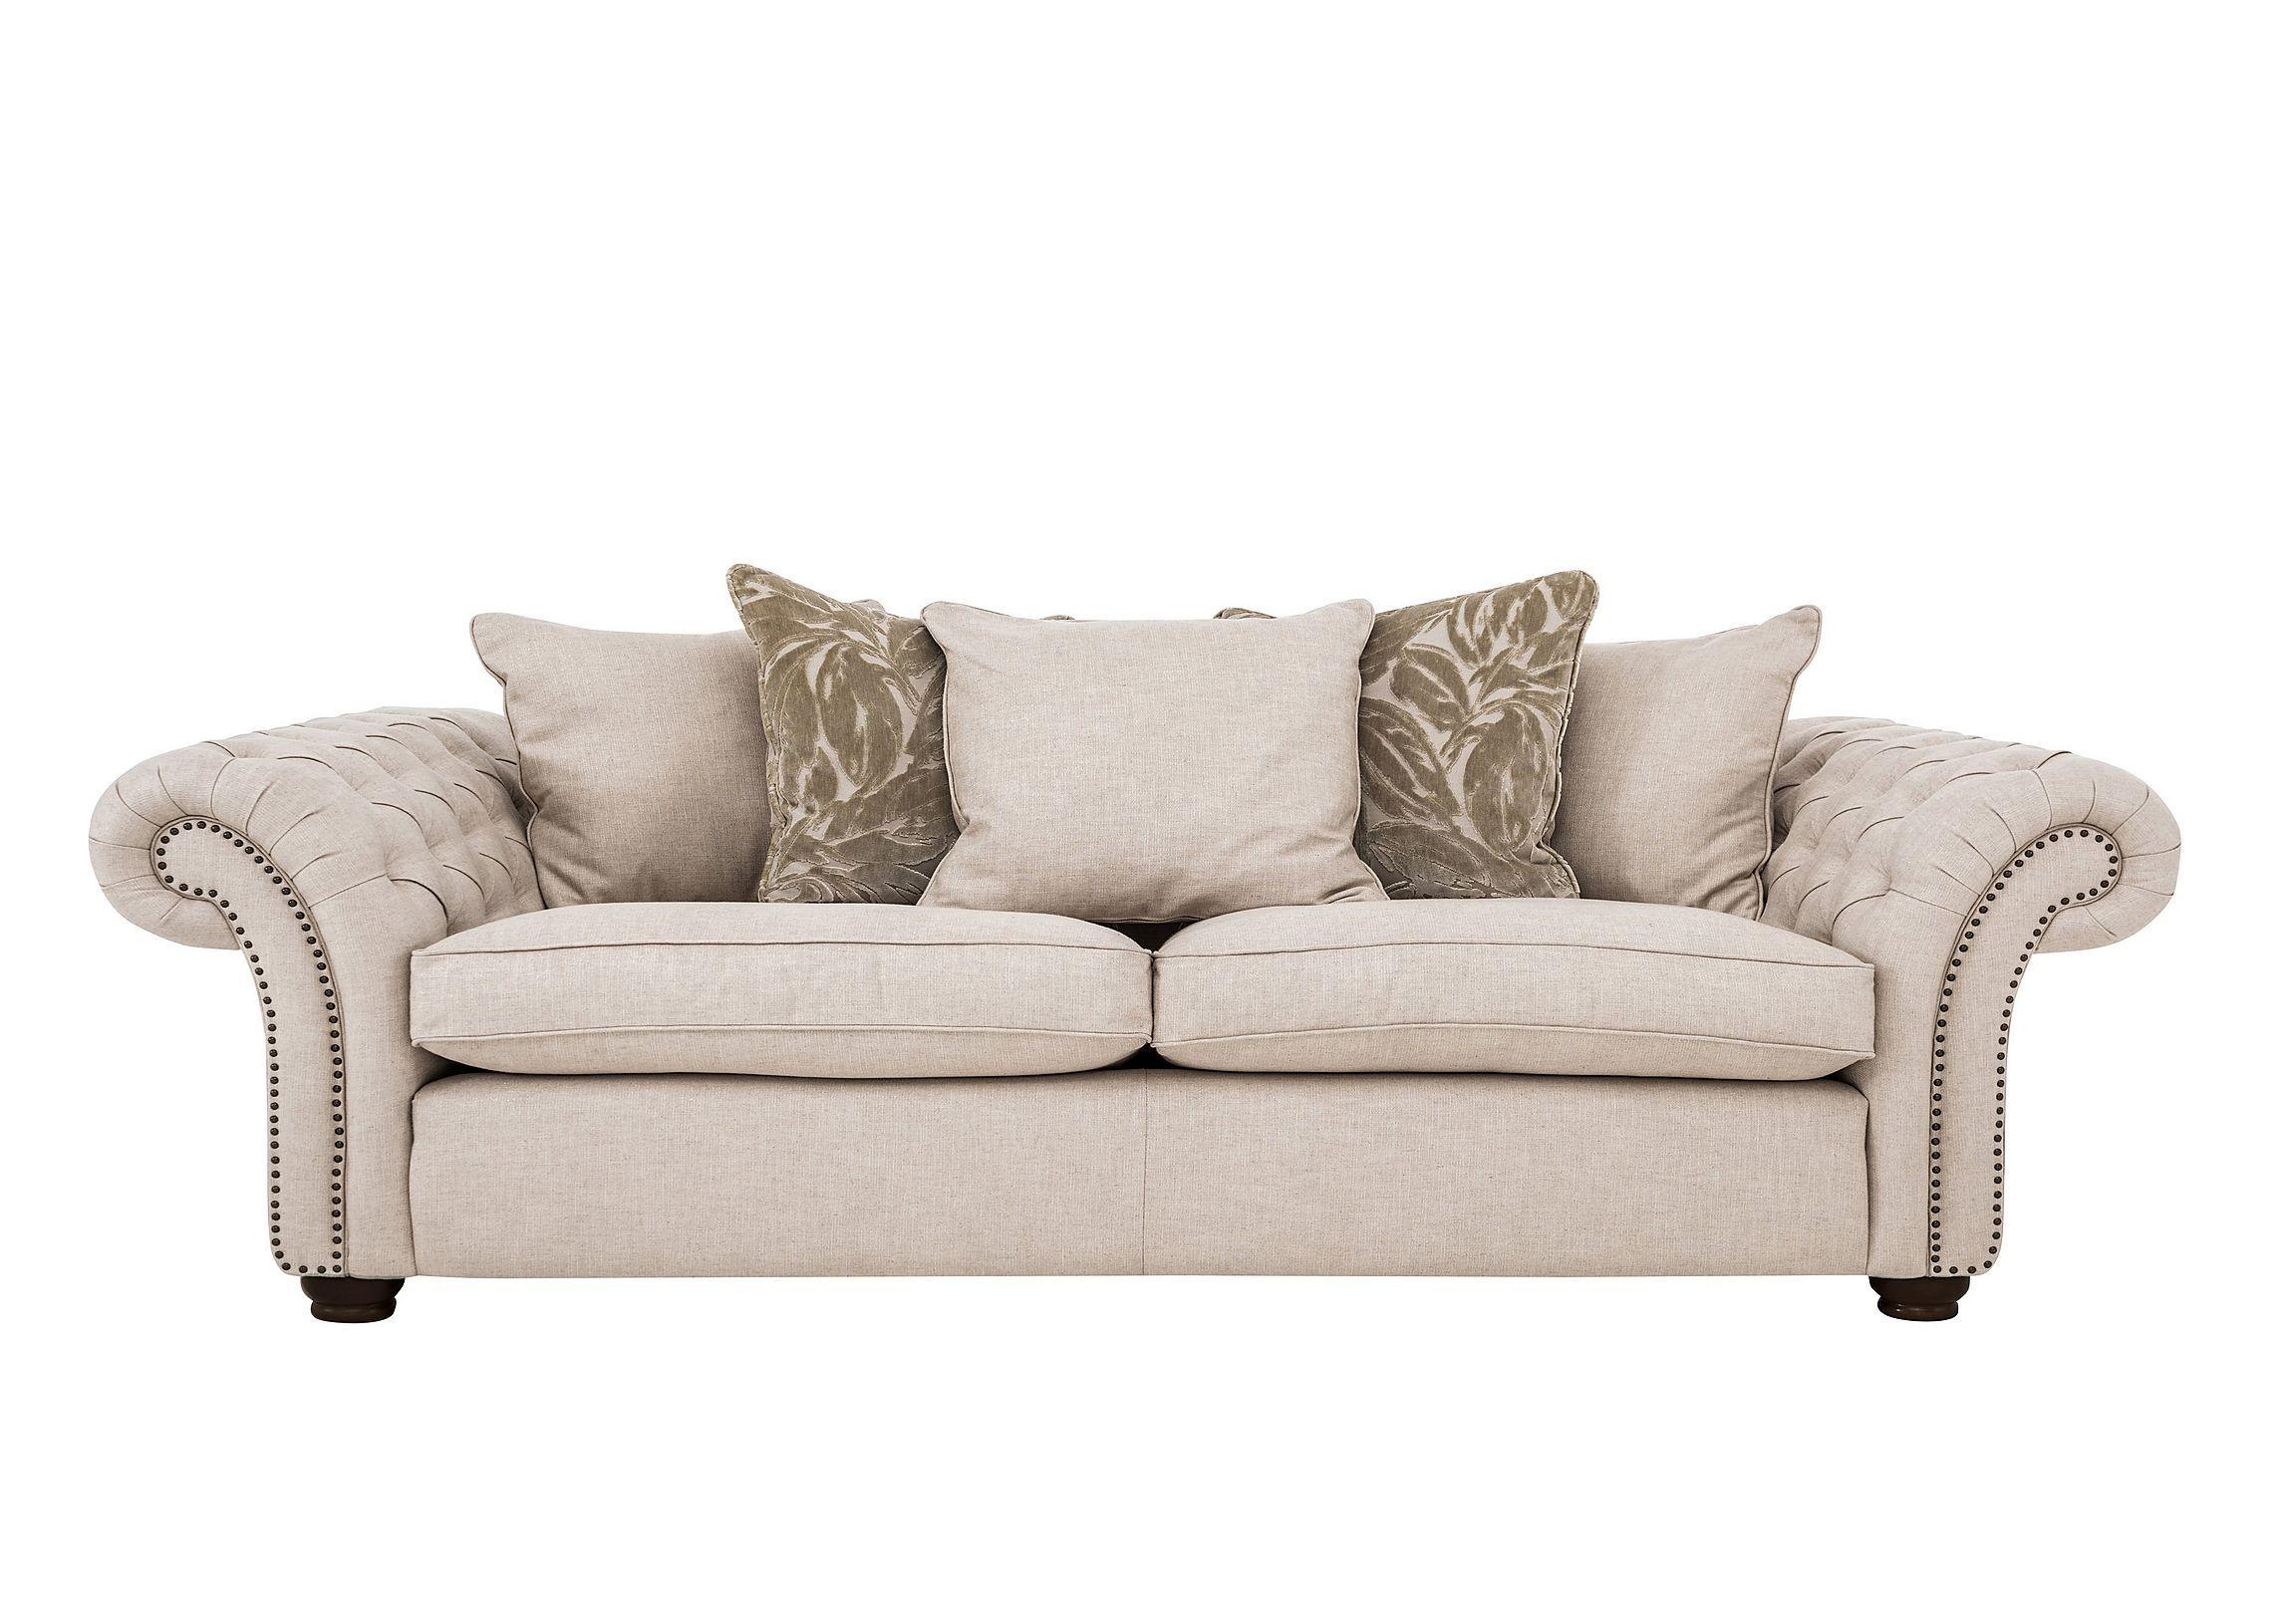 Lanesborough 4 Seater Pillow Back Fabric Sofa | New Lounge ...